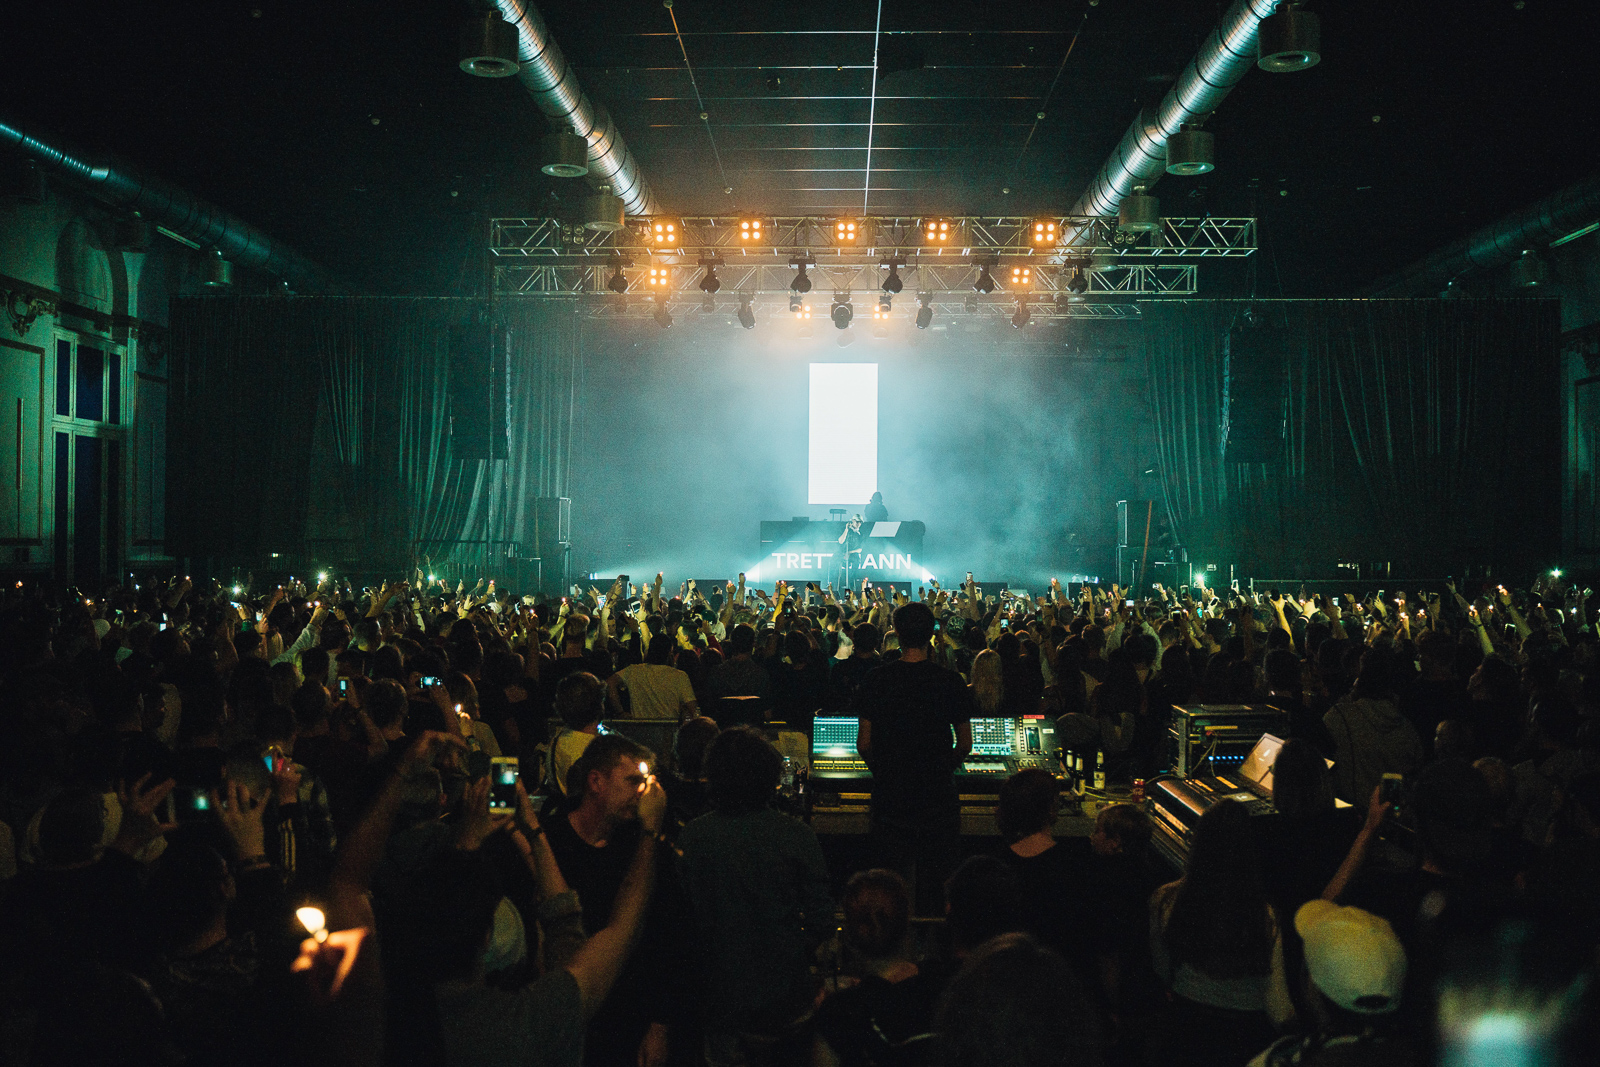 2019_RebeccaRuetten_Web_Spotify-8.jpg